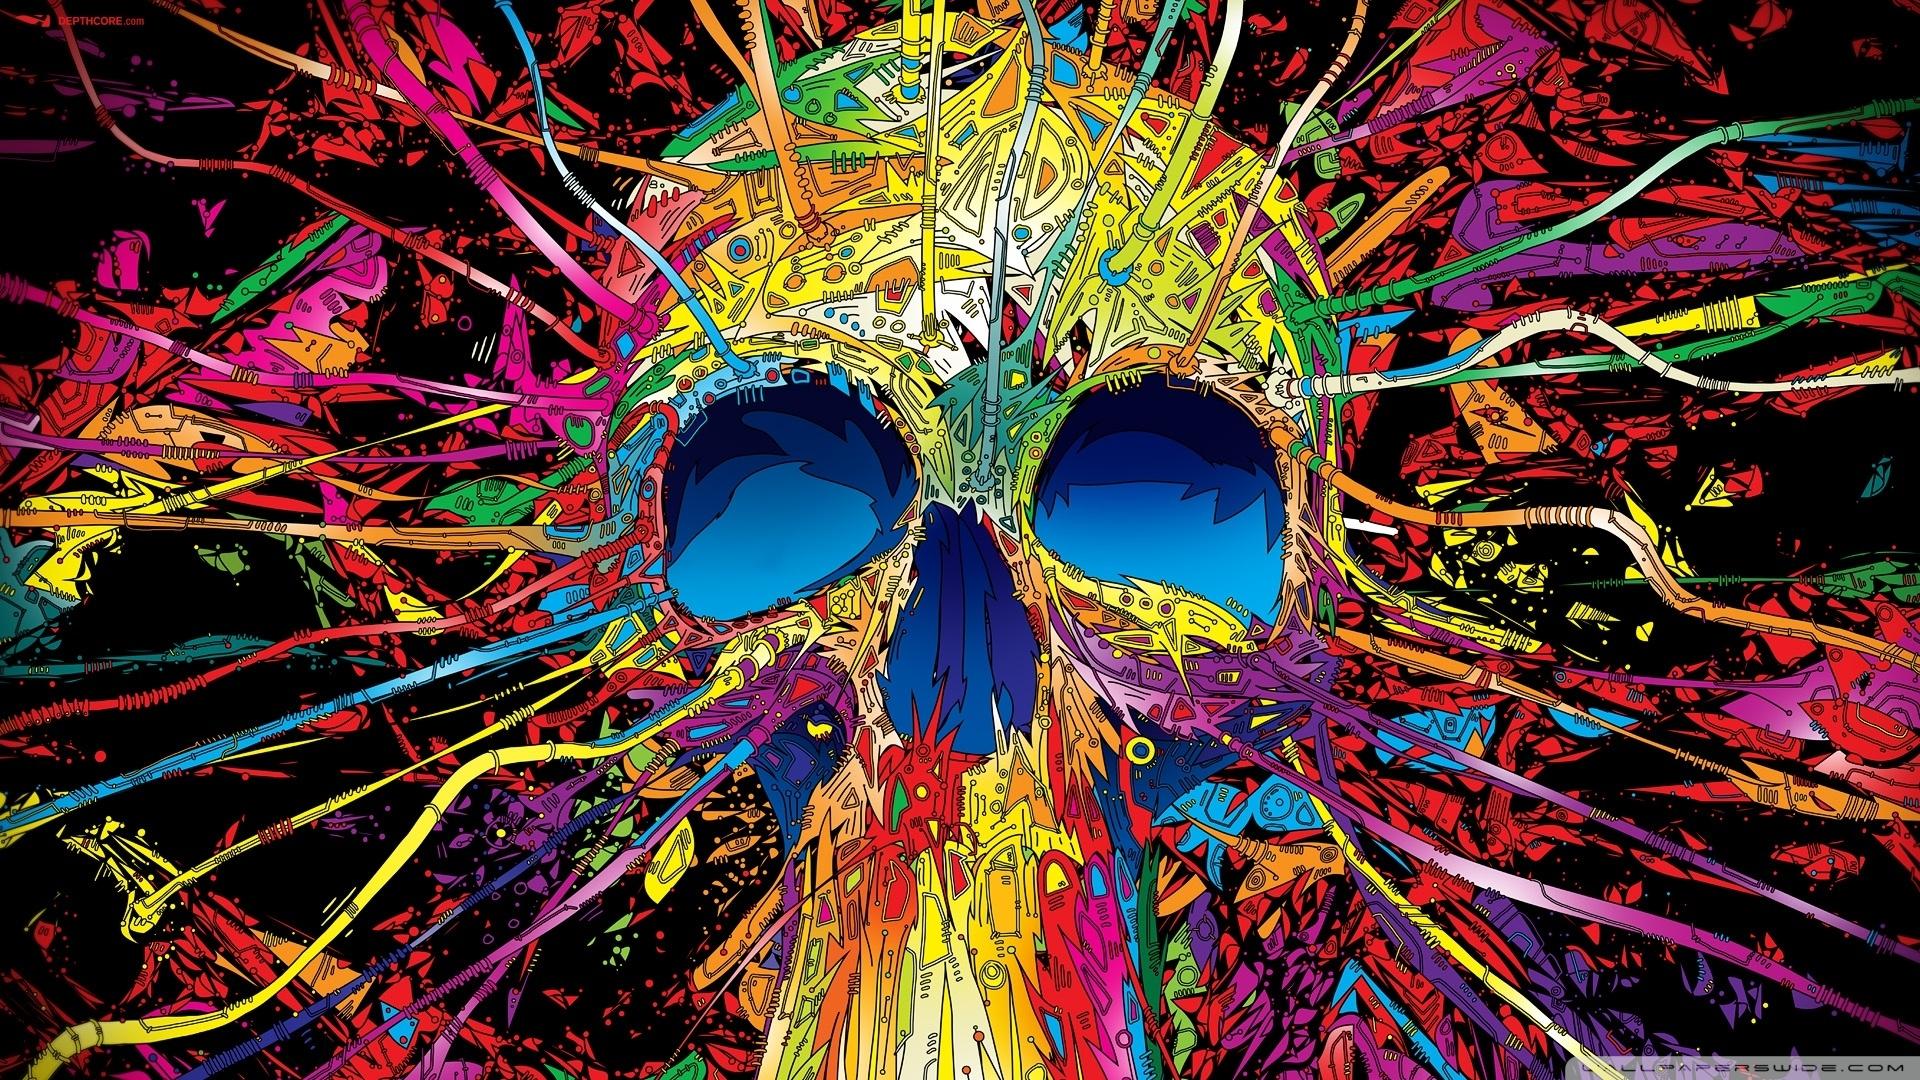 colorful skull ❤ 4k hd desktop wallpaper for 4k ultra hd tv